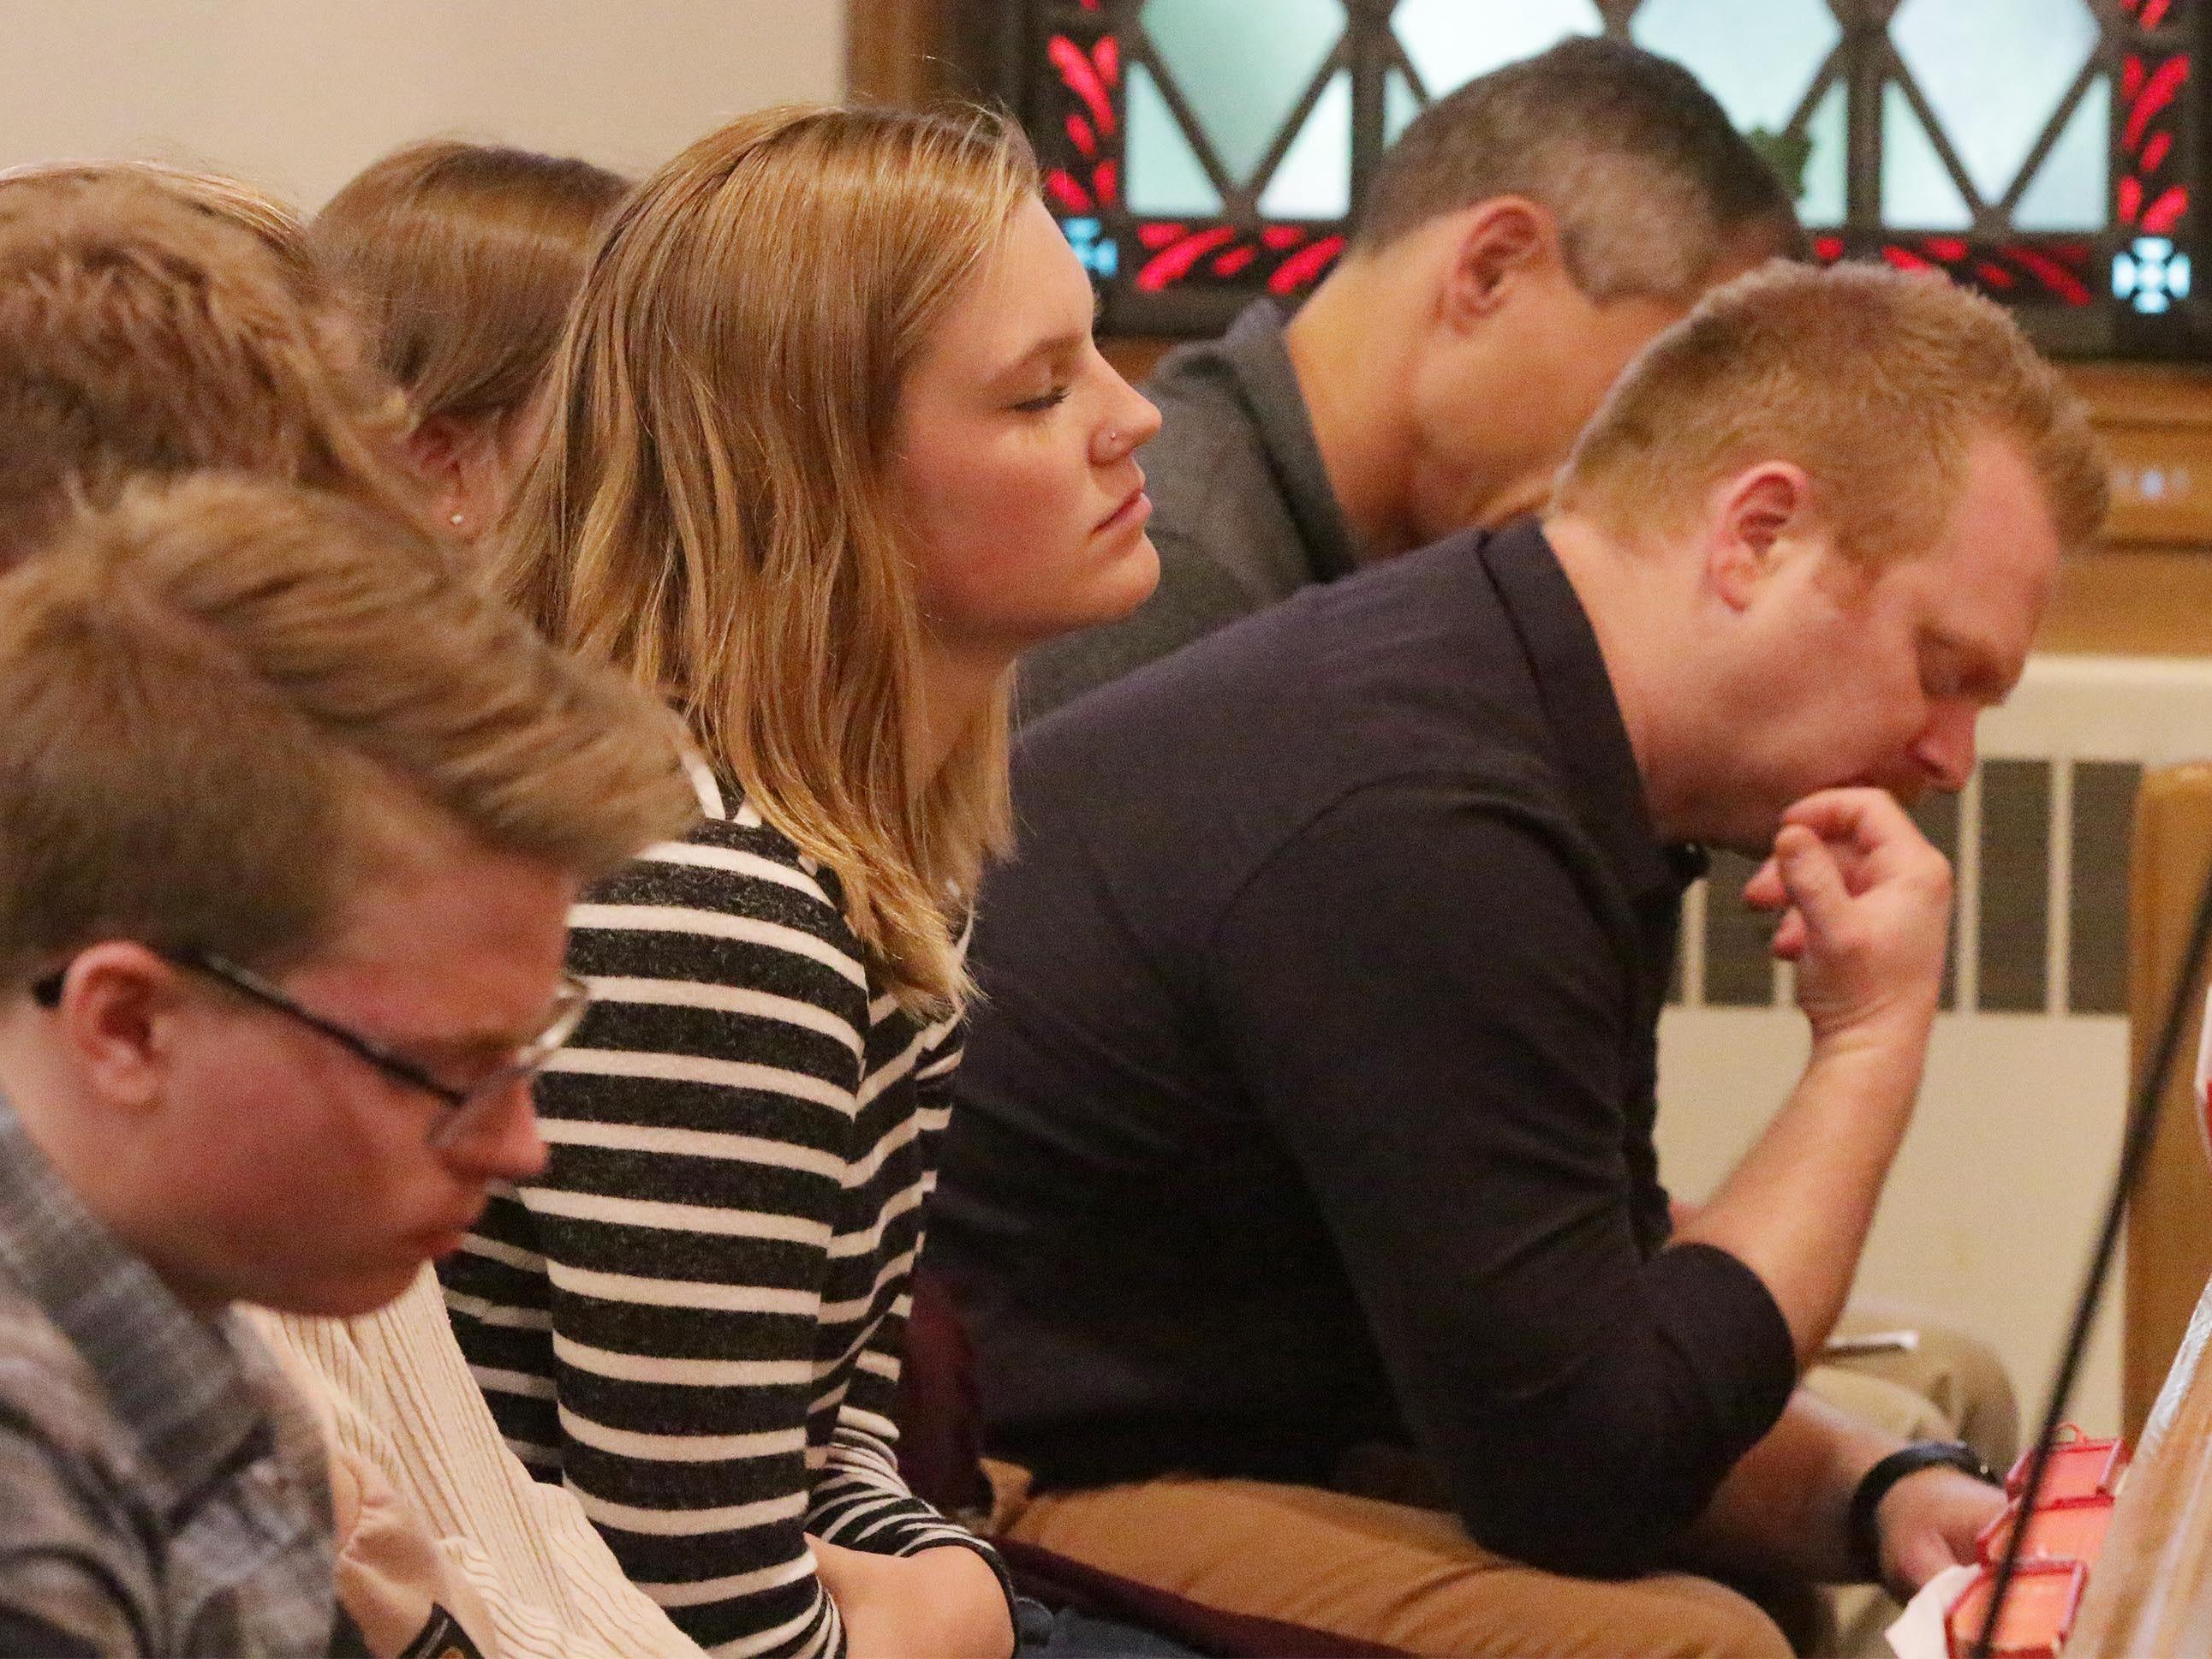 Students pray during the National Day of Prayer, Thursday, May 2, 2019, at Fountain Park Church, in Sheboygan, Wis.